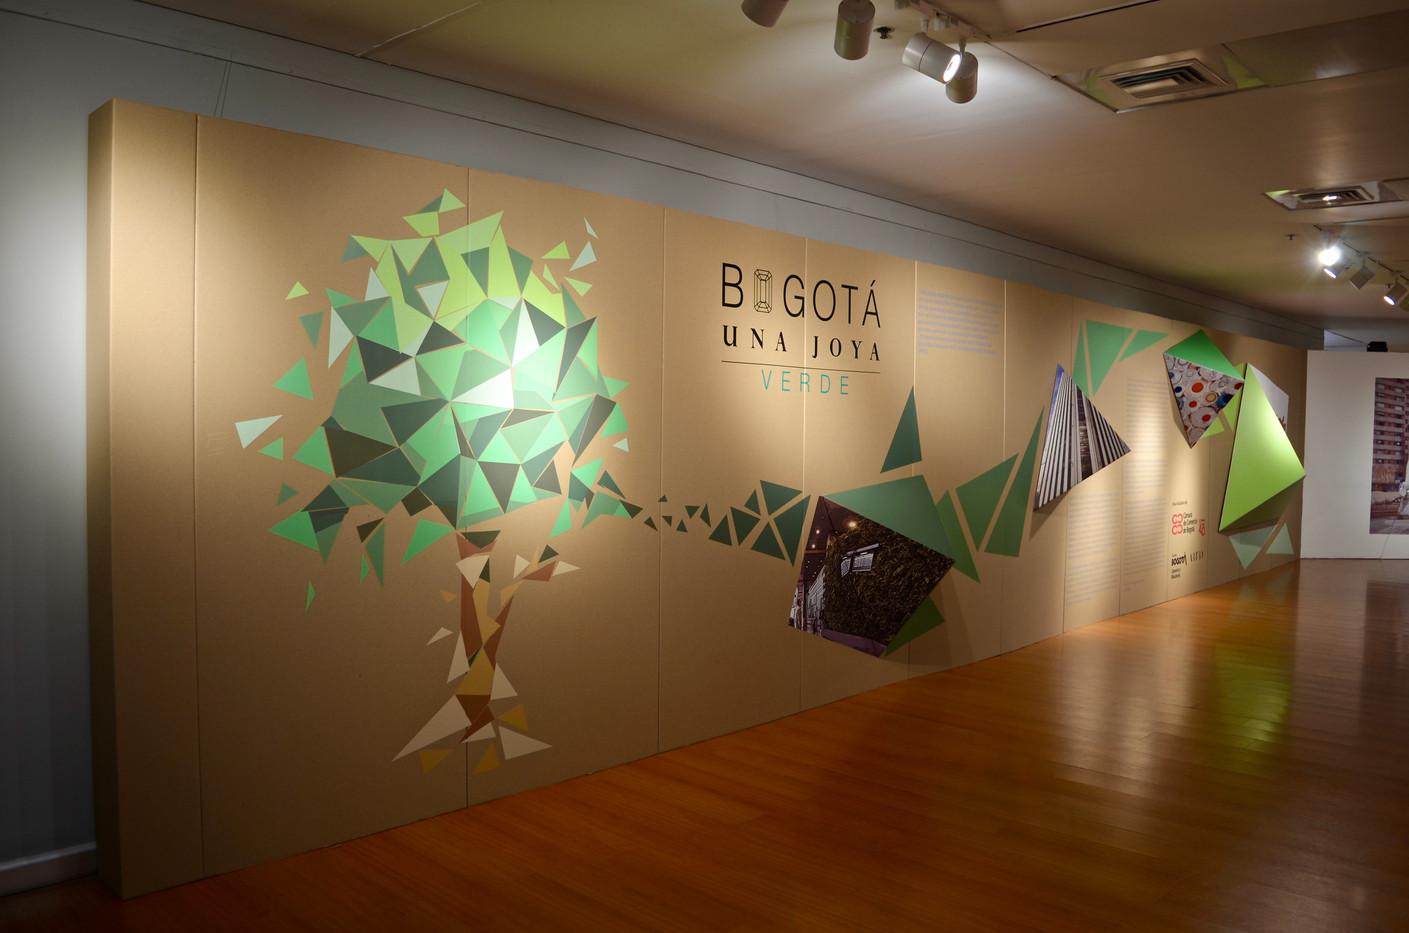 Bogota una joya verde